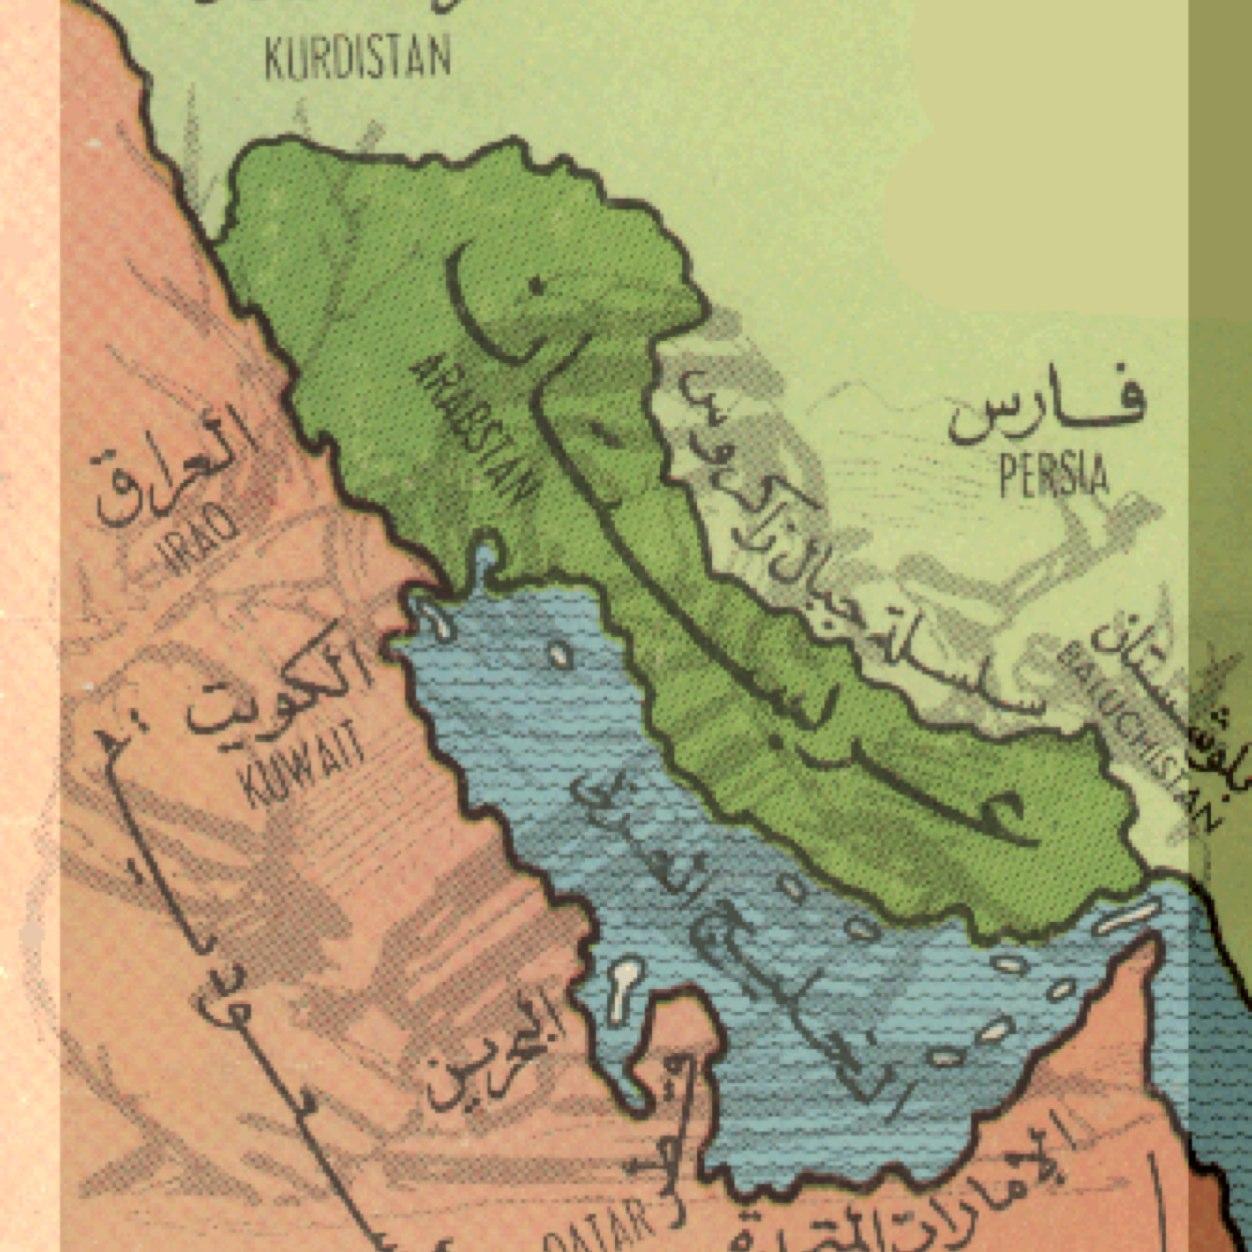 @iranianaffairs